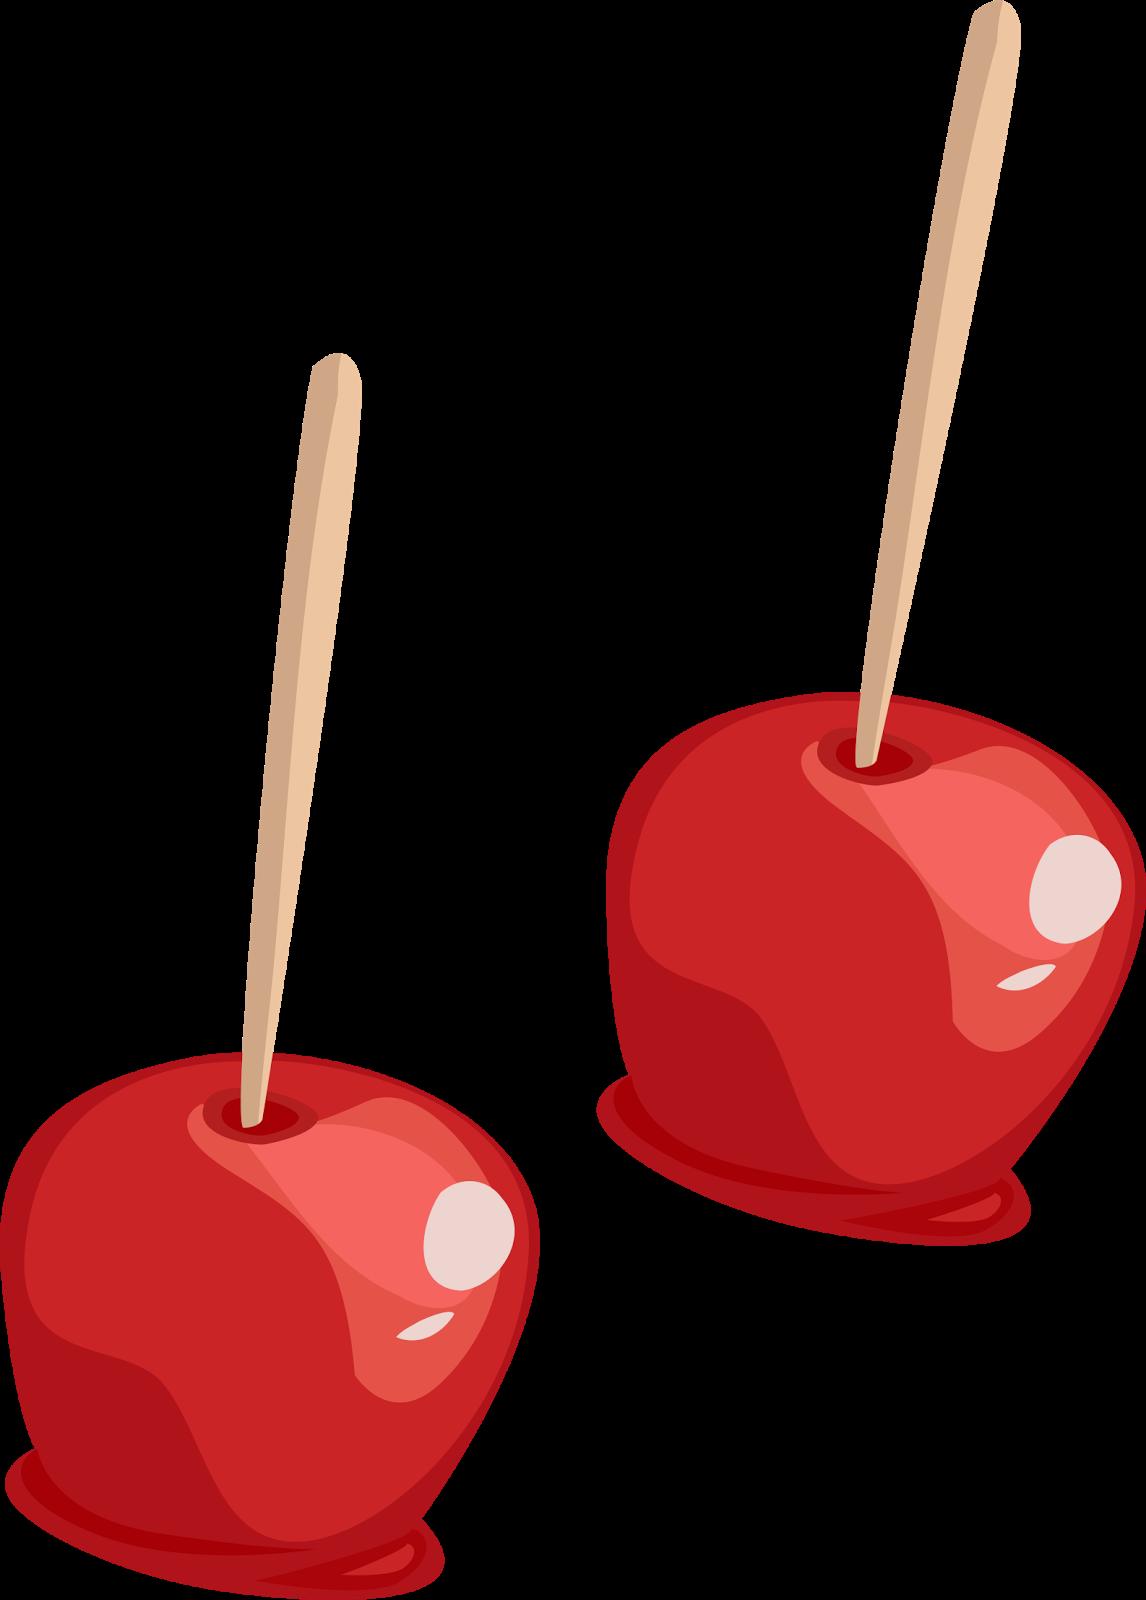 Candy apple clipart jpg royalty free Chapeu png, milho png, pipoca png, viola png bandeirinhas png ... jpg royalty free